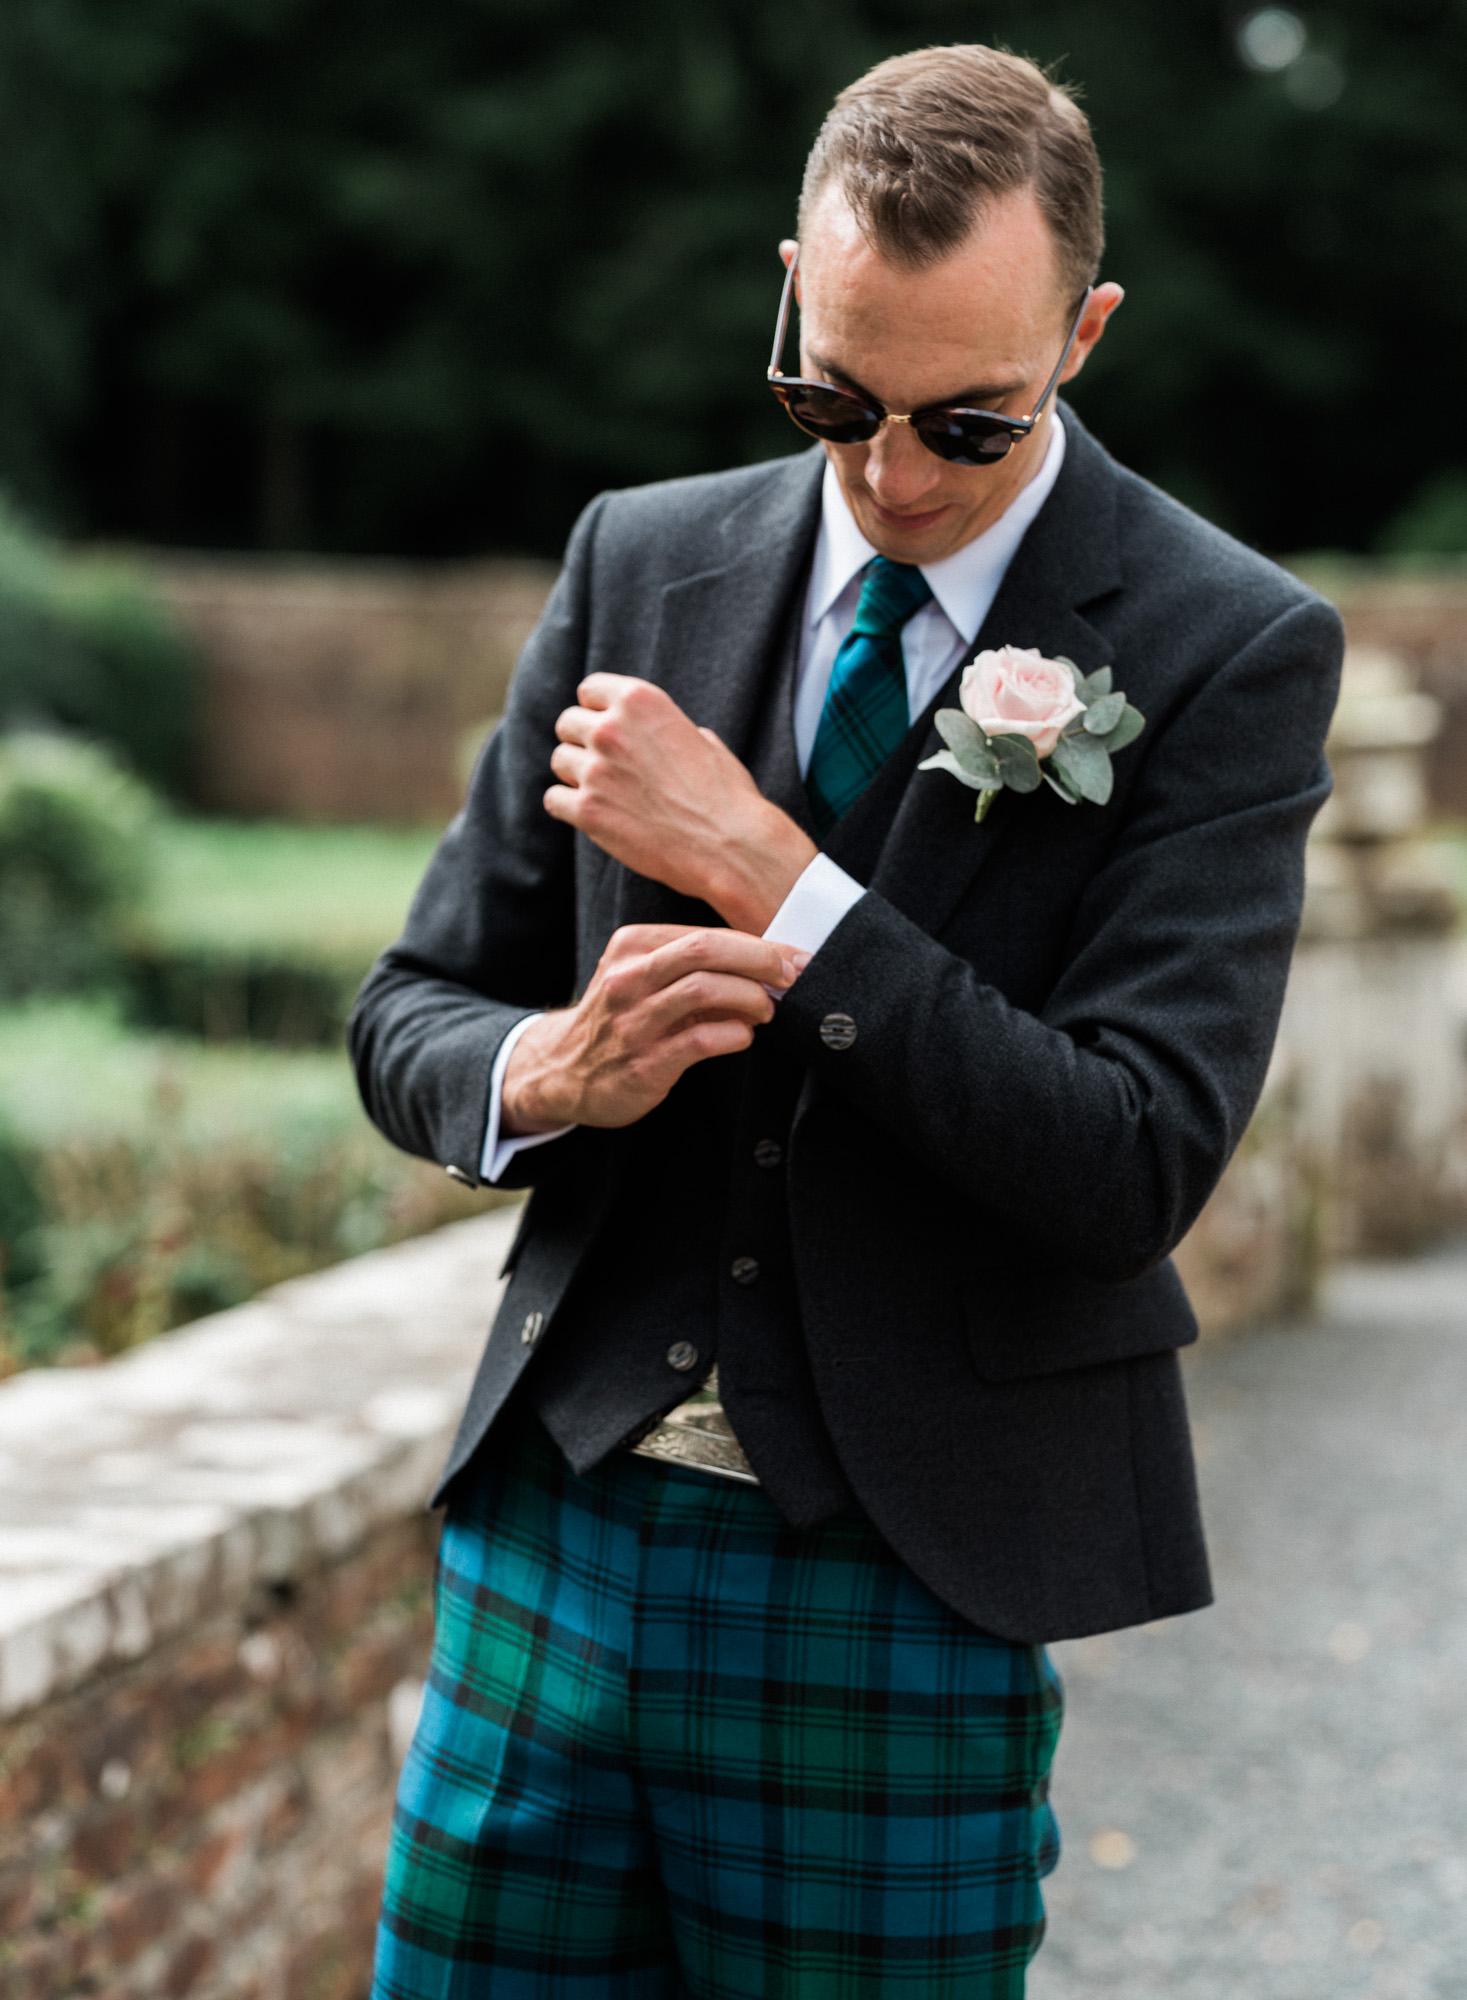 scottish_wedding_blairquhan_castle-55.jpg